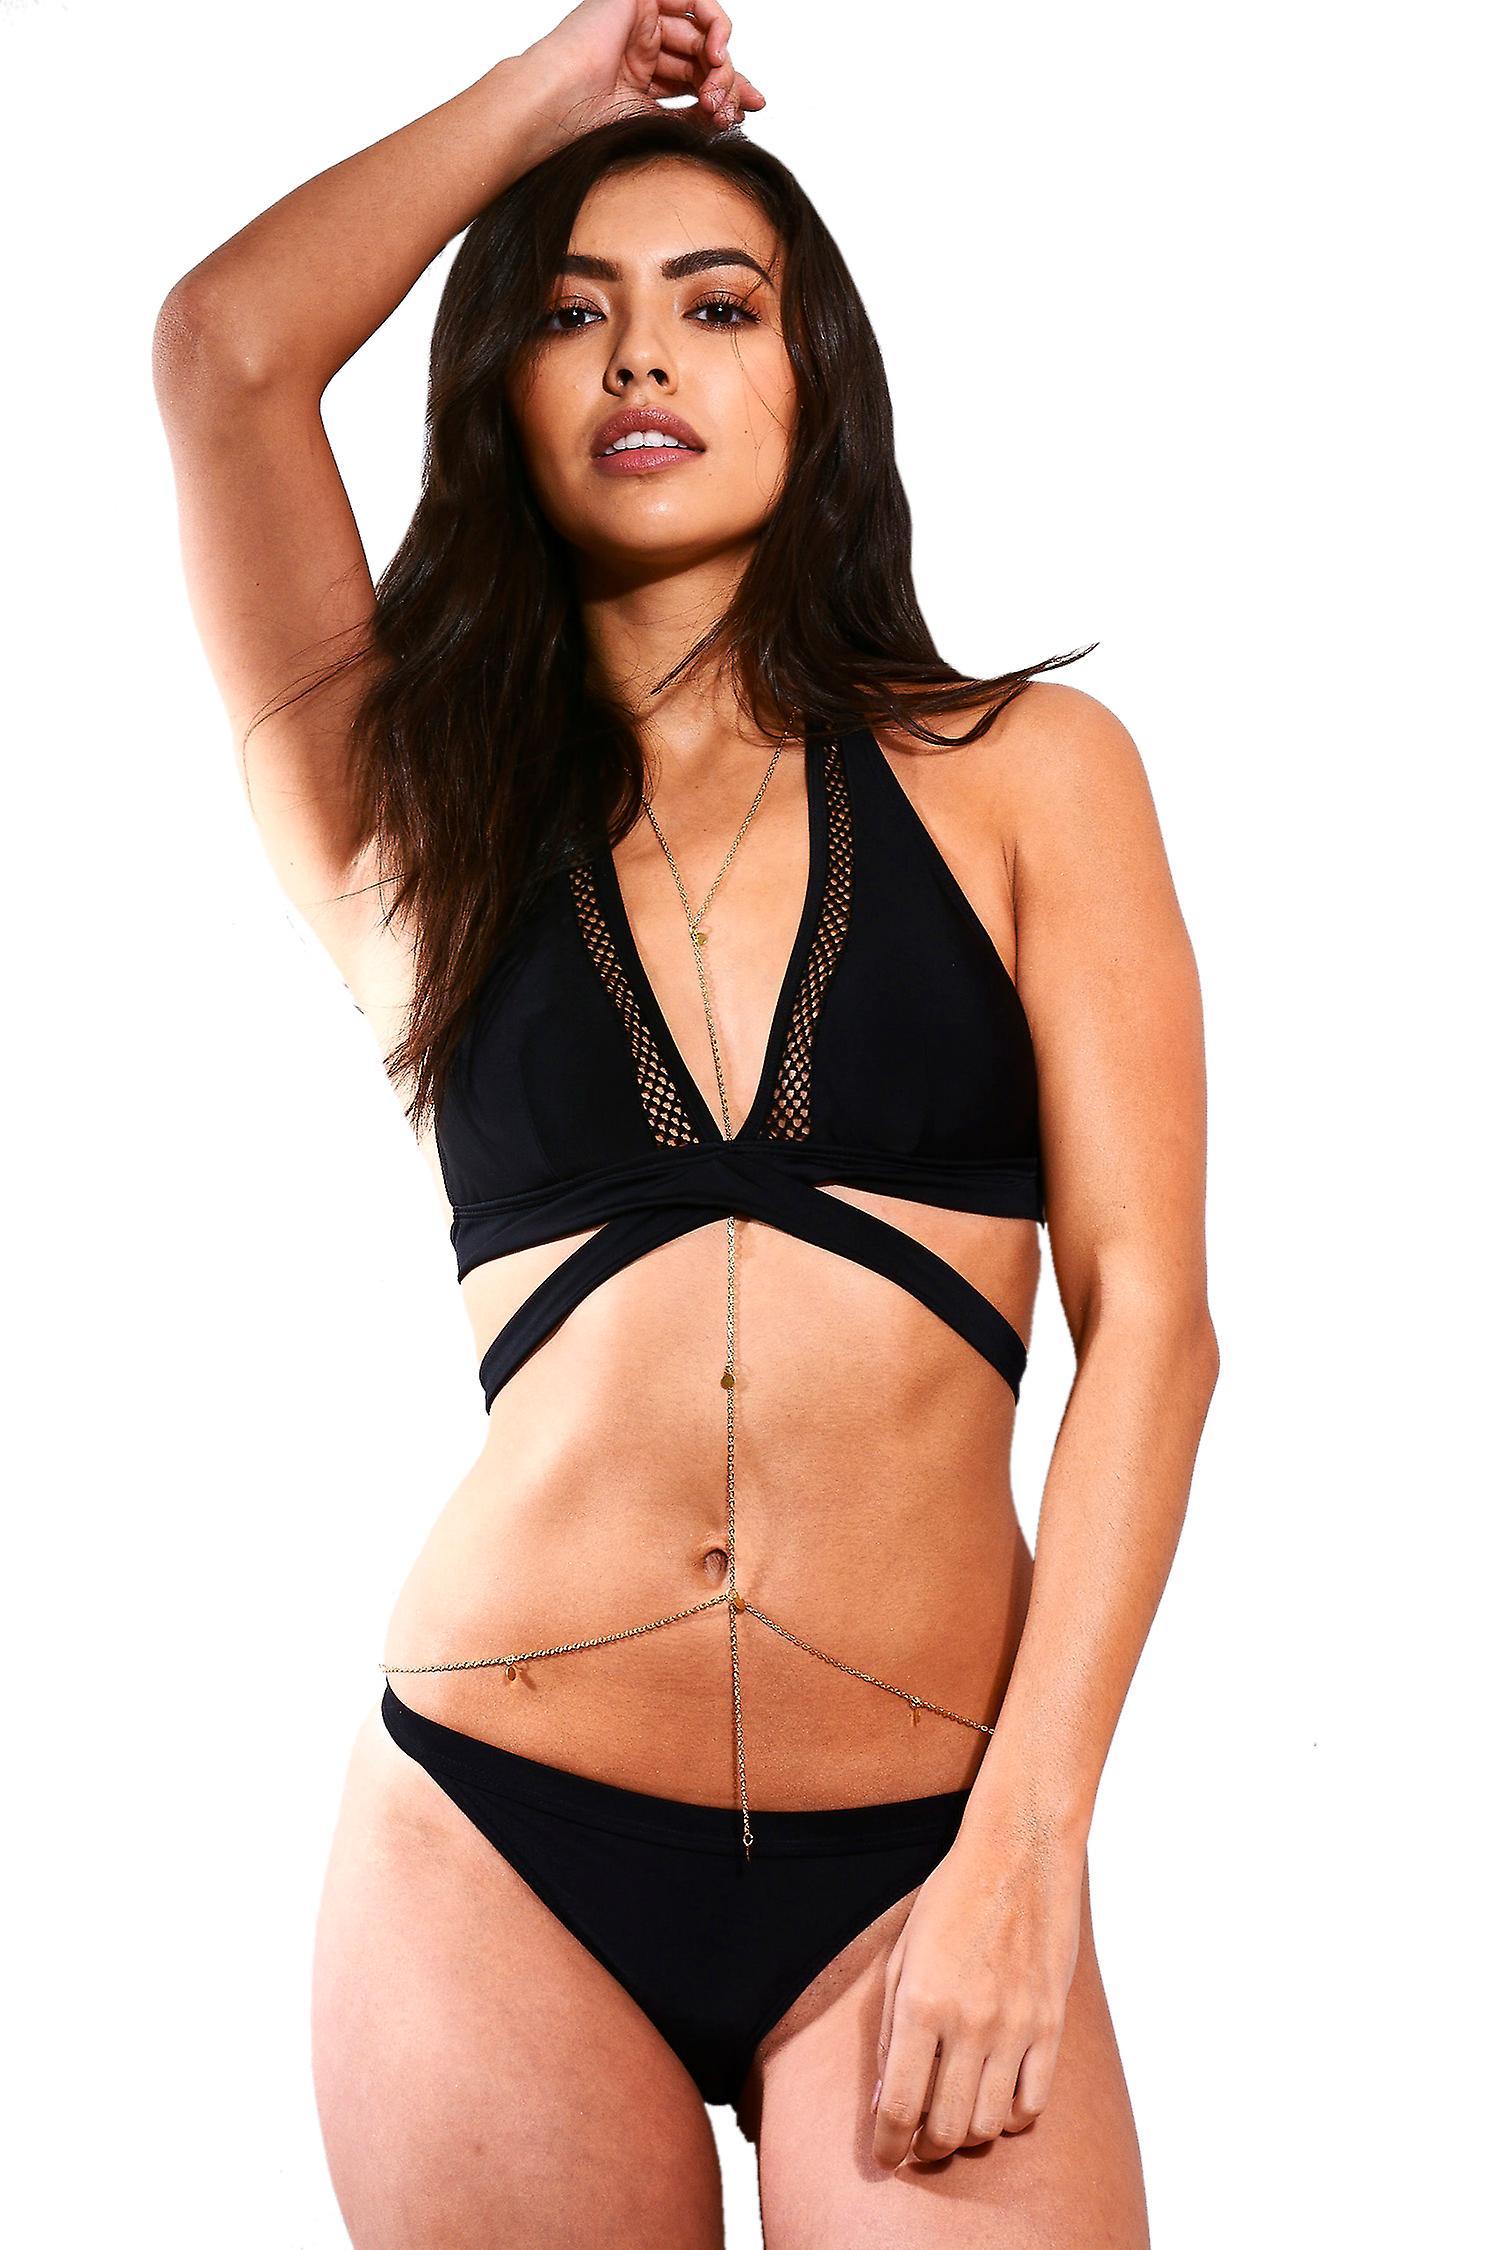 LMS Black Double Strap Halter Neck Bikini With Mesh Insert Detail - SAMPLE